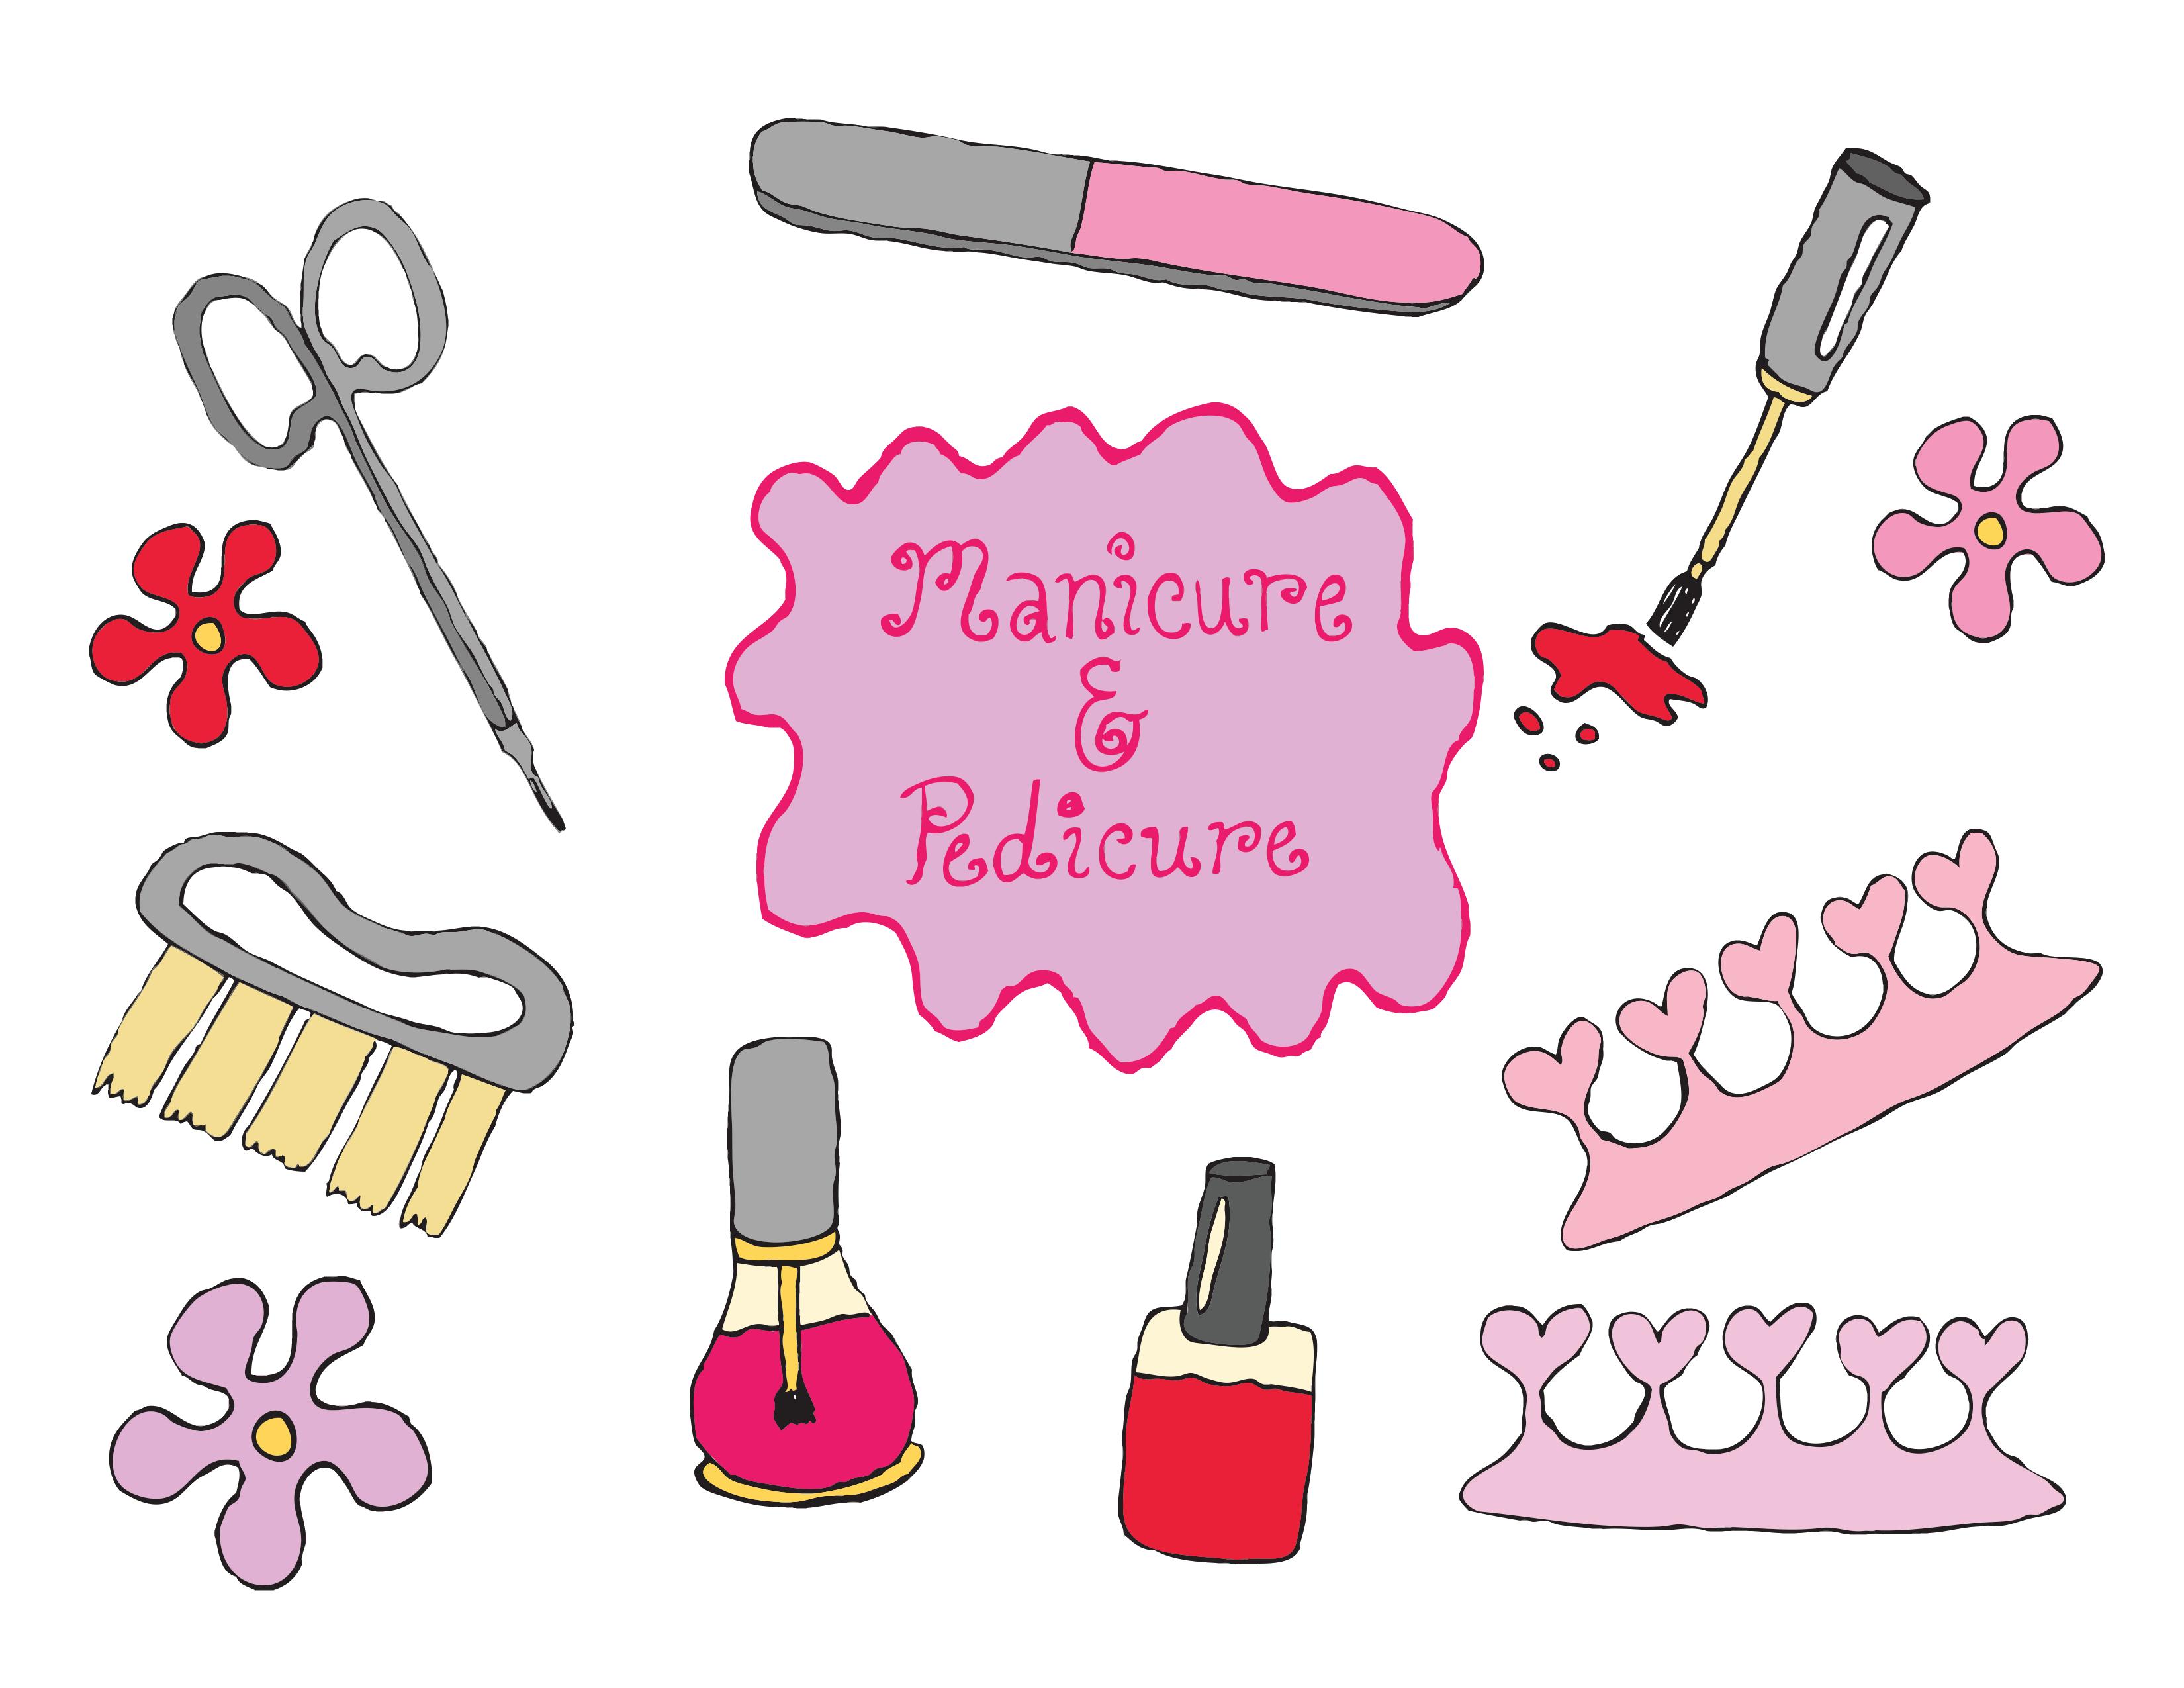 Nails clipart manicured hand. Manicure pedicure nail polish